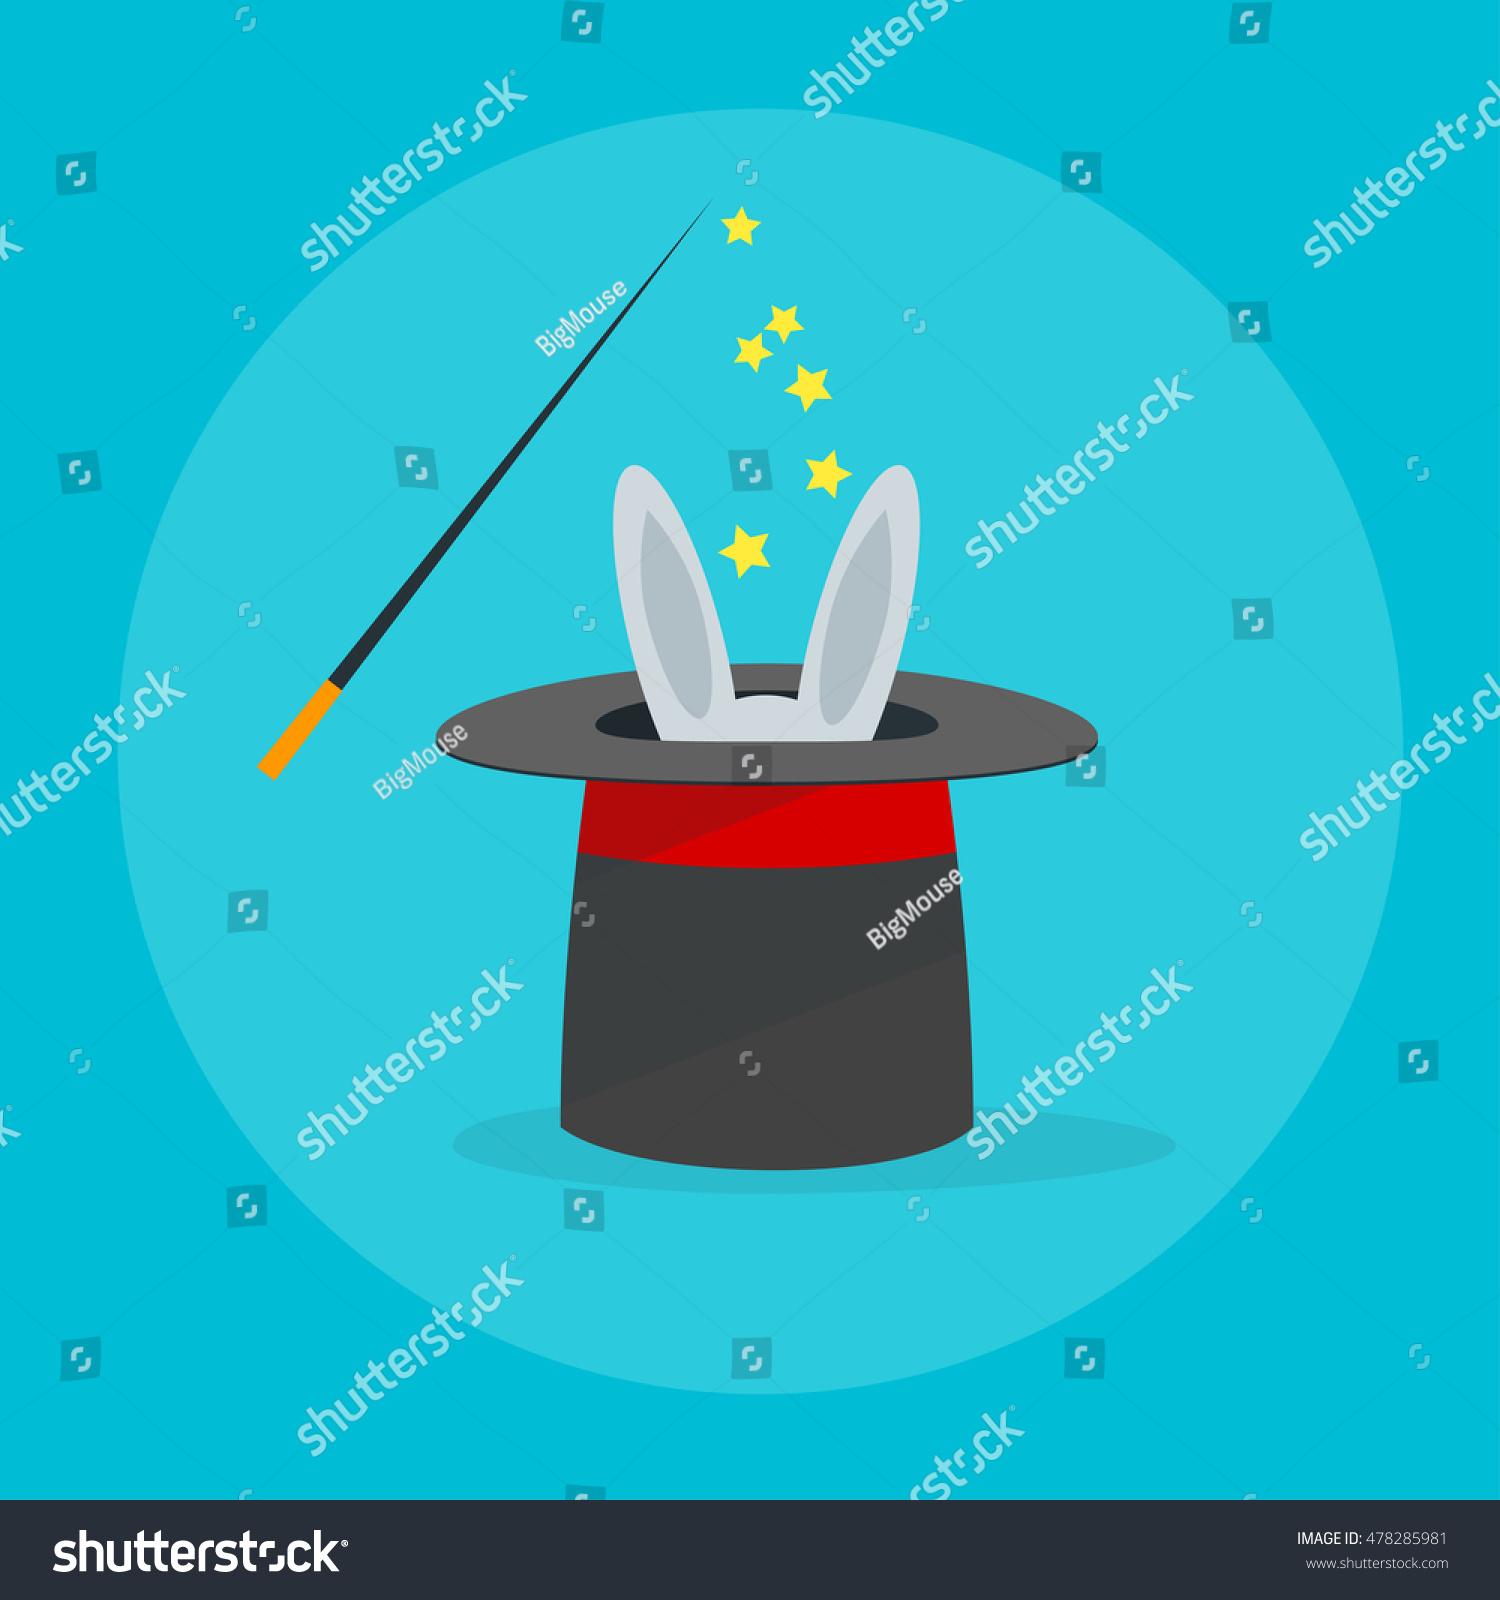 Rabbit Magic Hat Wand Flat Design Stock Vector 478285981 - Shutterstock